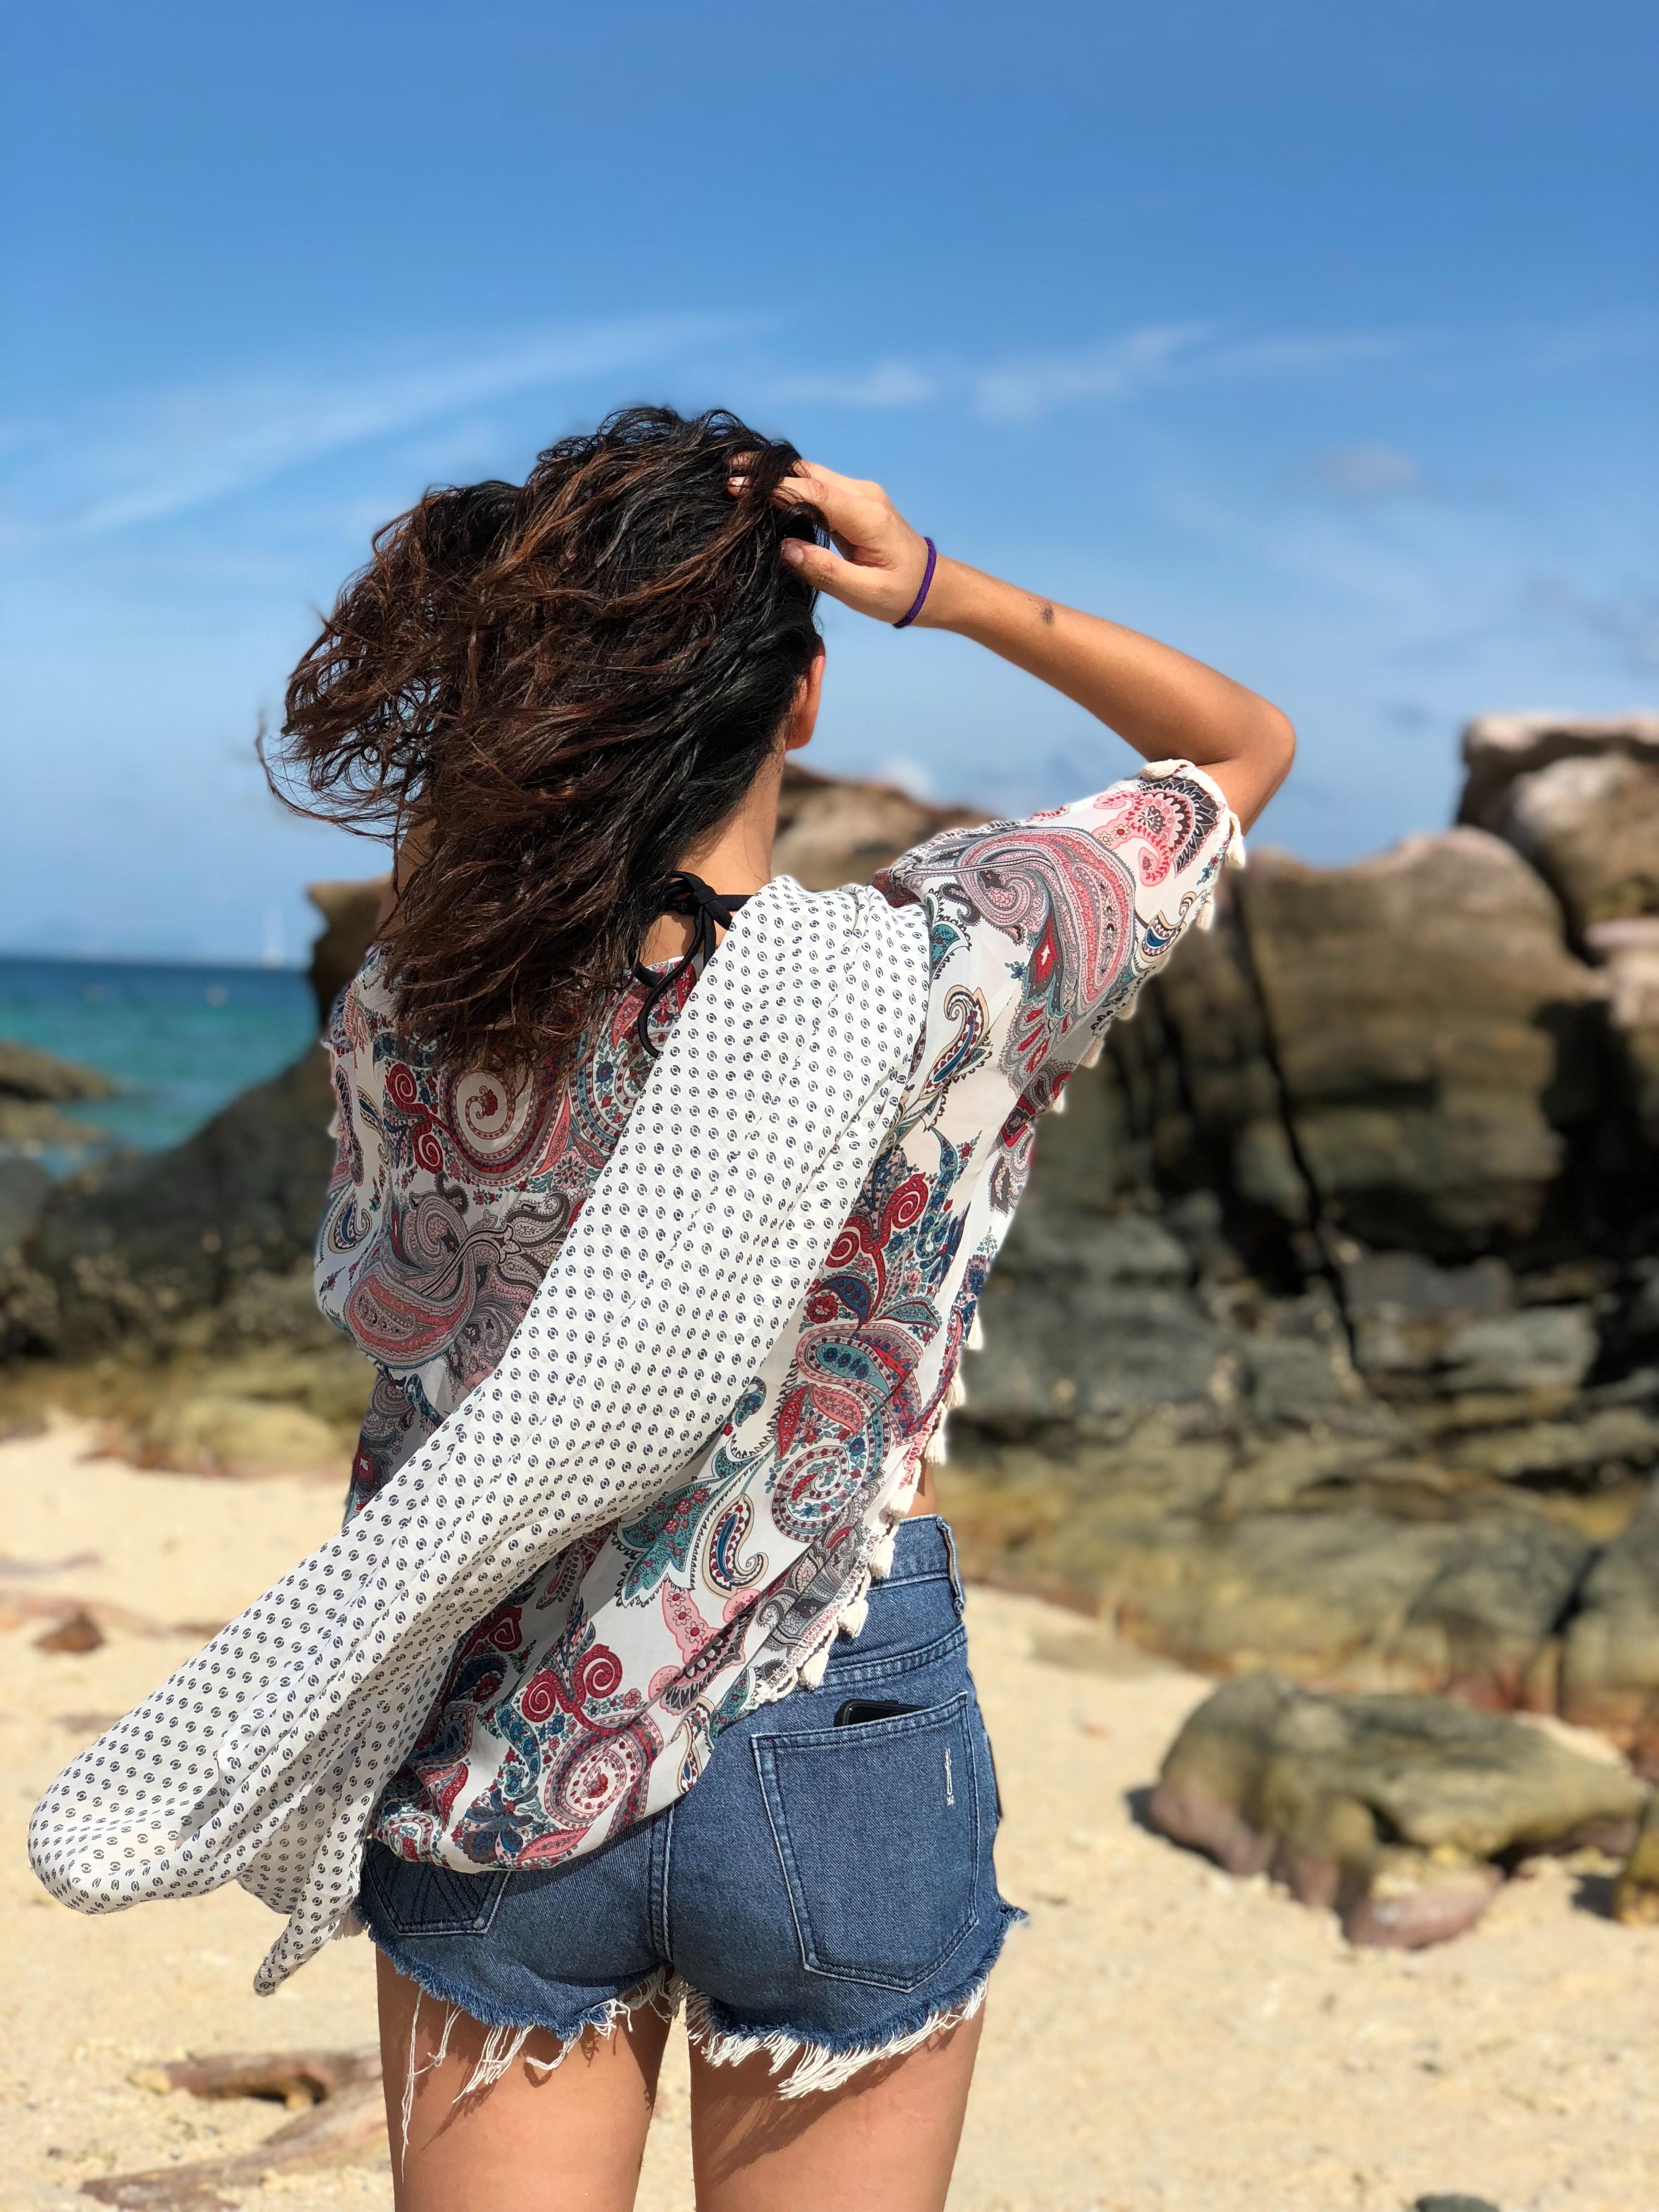 Фото и картинки со спины девушек брюнеток